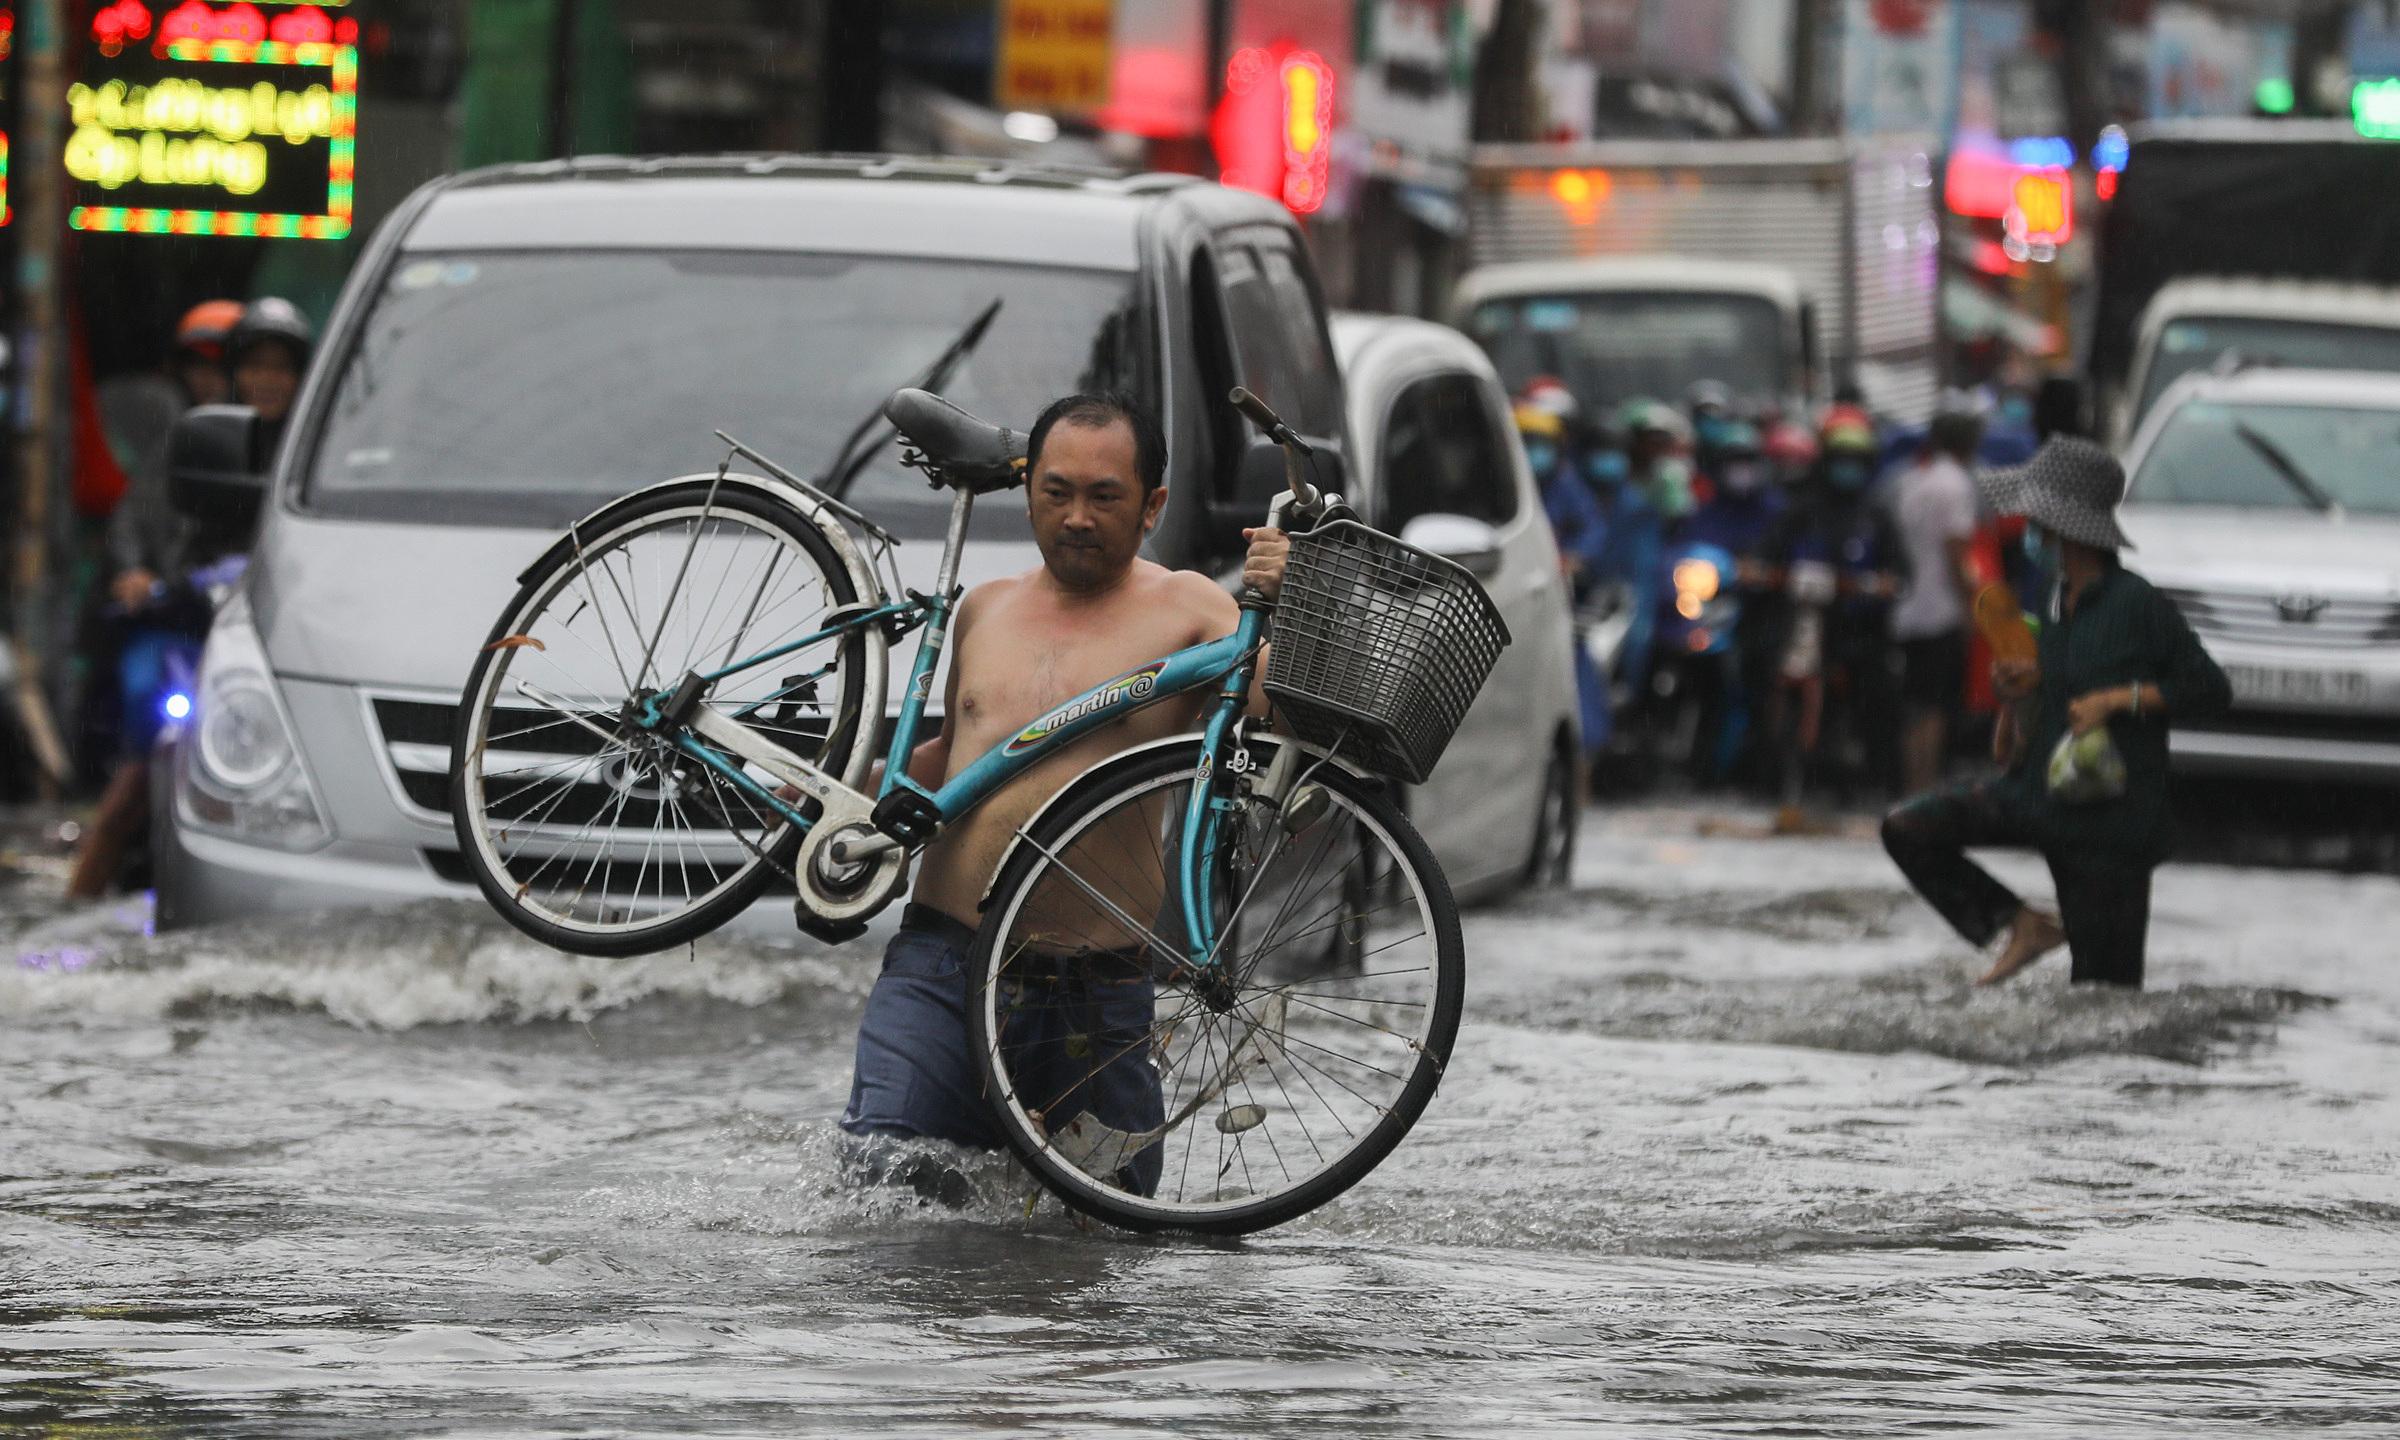 Climate change 'war without gunfire', president tells UN Security Council